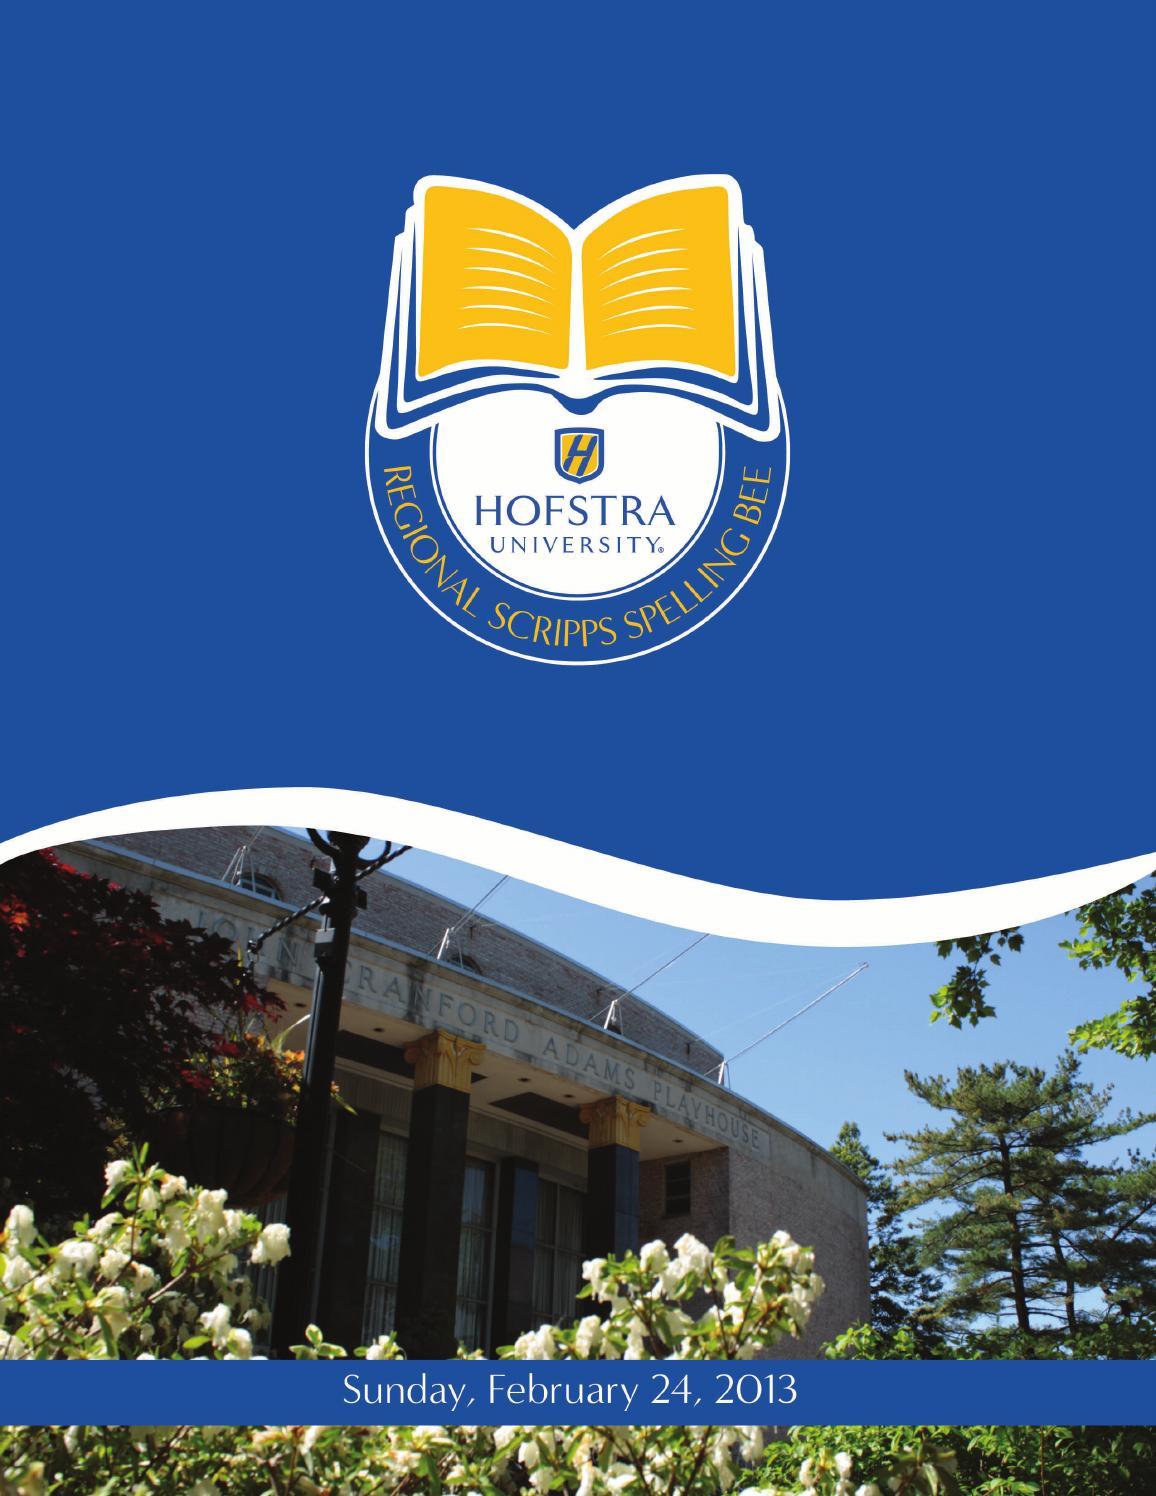 hofstra writing center Writing center tutor - hofstra university jobs, companies, people, and articles for linkedin's writing center tutor - hofstra university members.